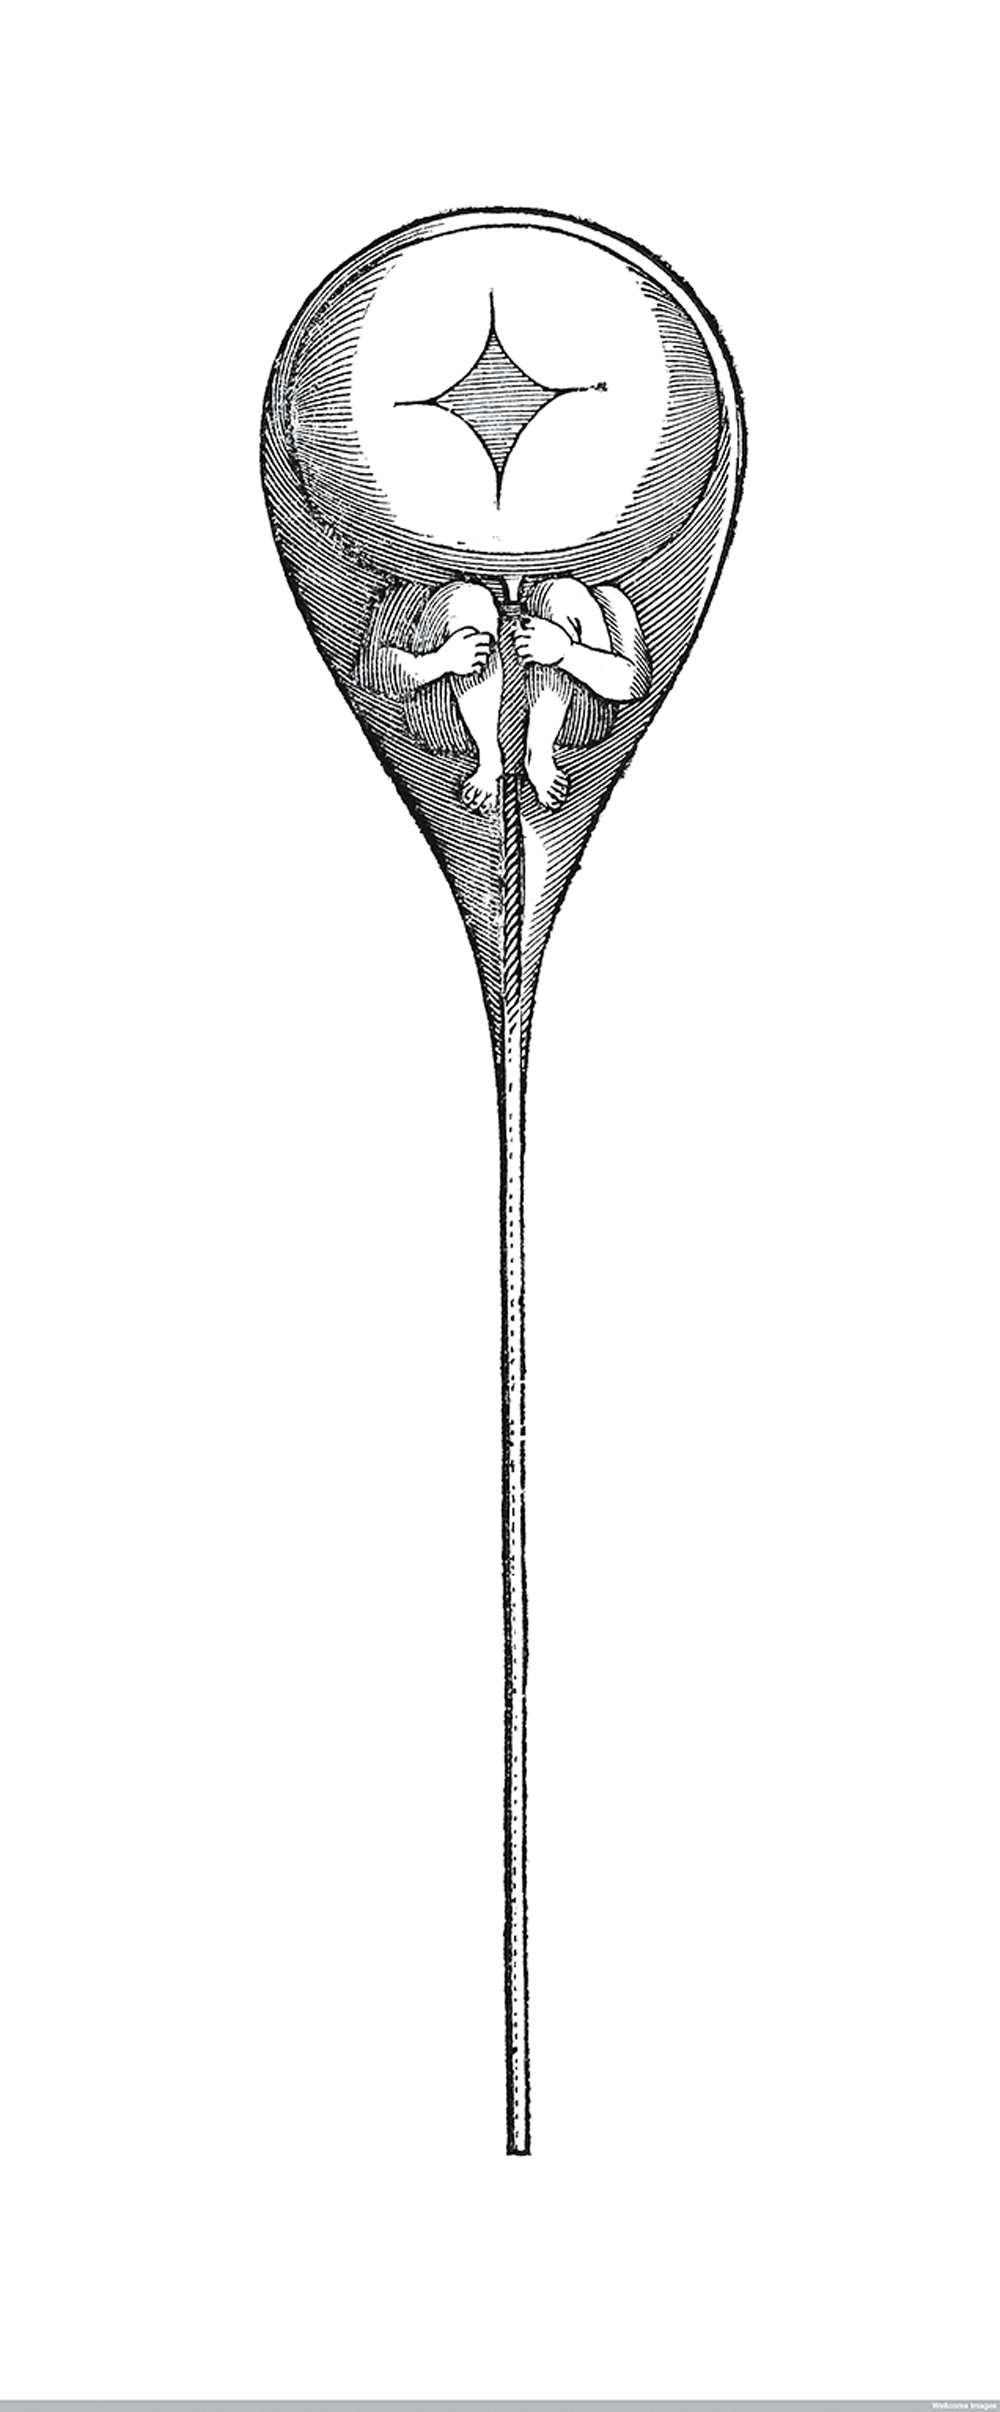 Sperm containing a homunculus (Nicholas Hartsoeker, 1695).